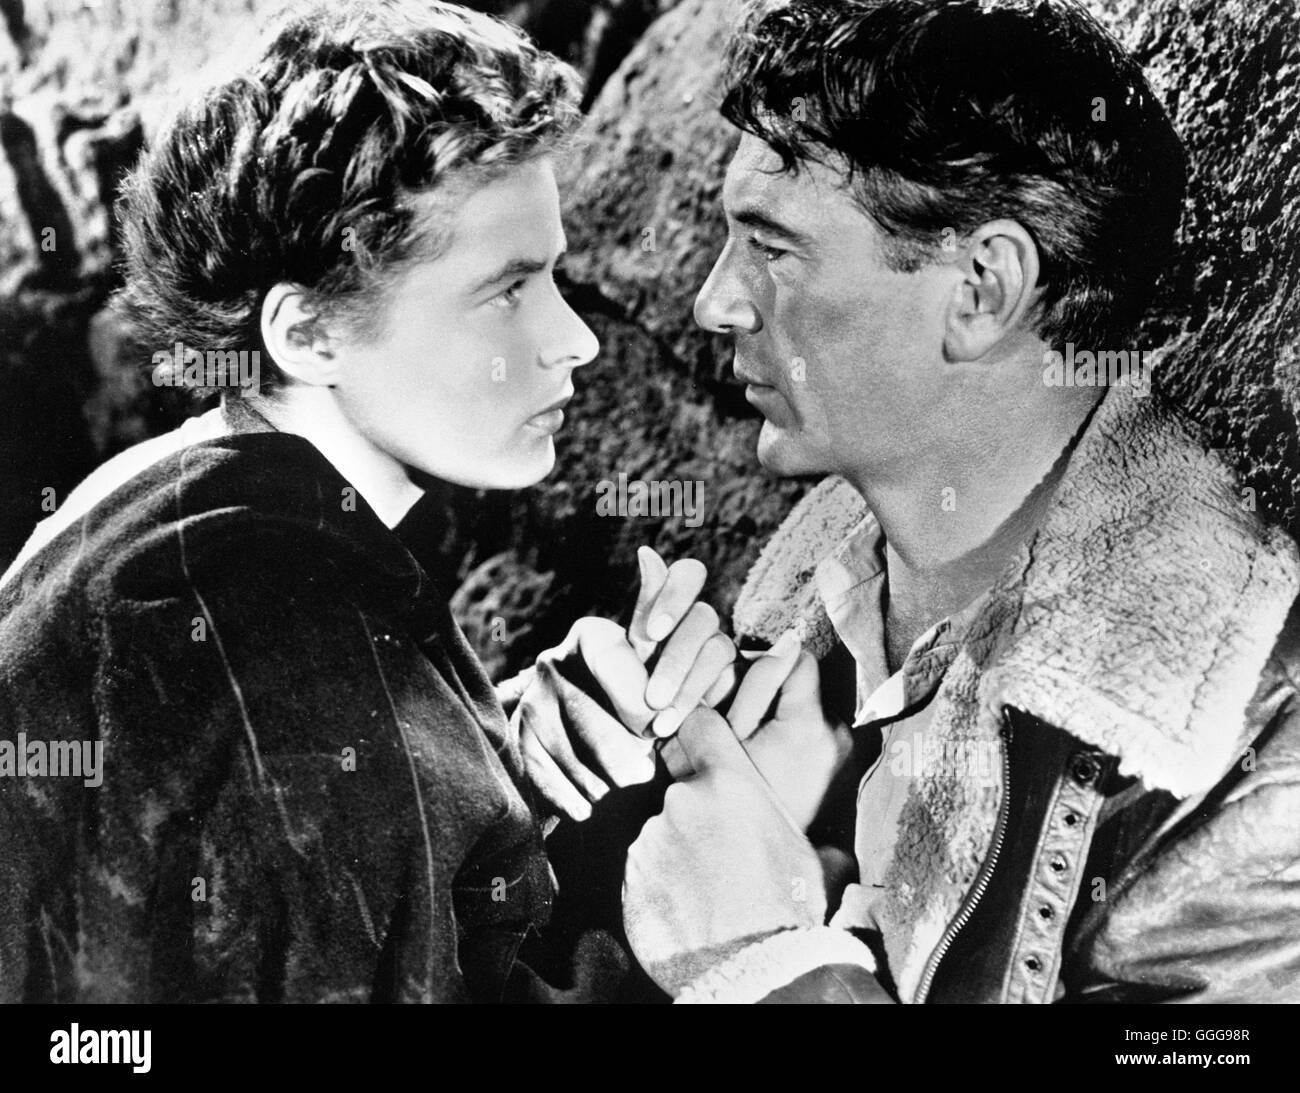 WEM DIE STUNDE SCHLÄGT / For whom the bell tolls USA 1943 / Sam Wood INGRID BERGMAN (Maria), GARY COOPER (Robert - Stock Image